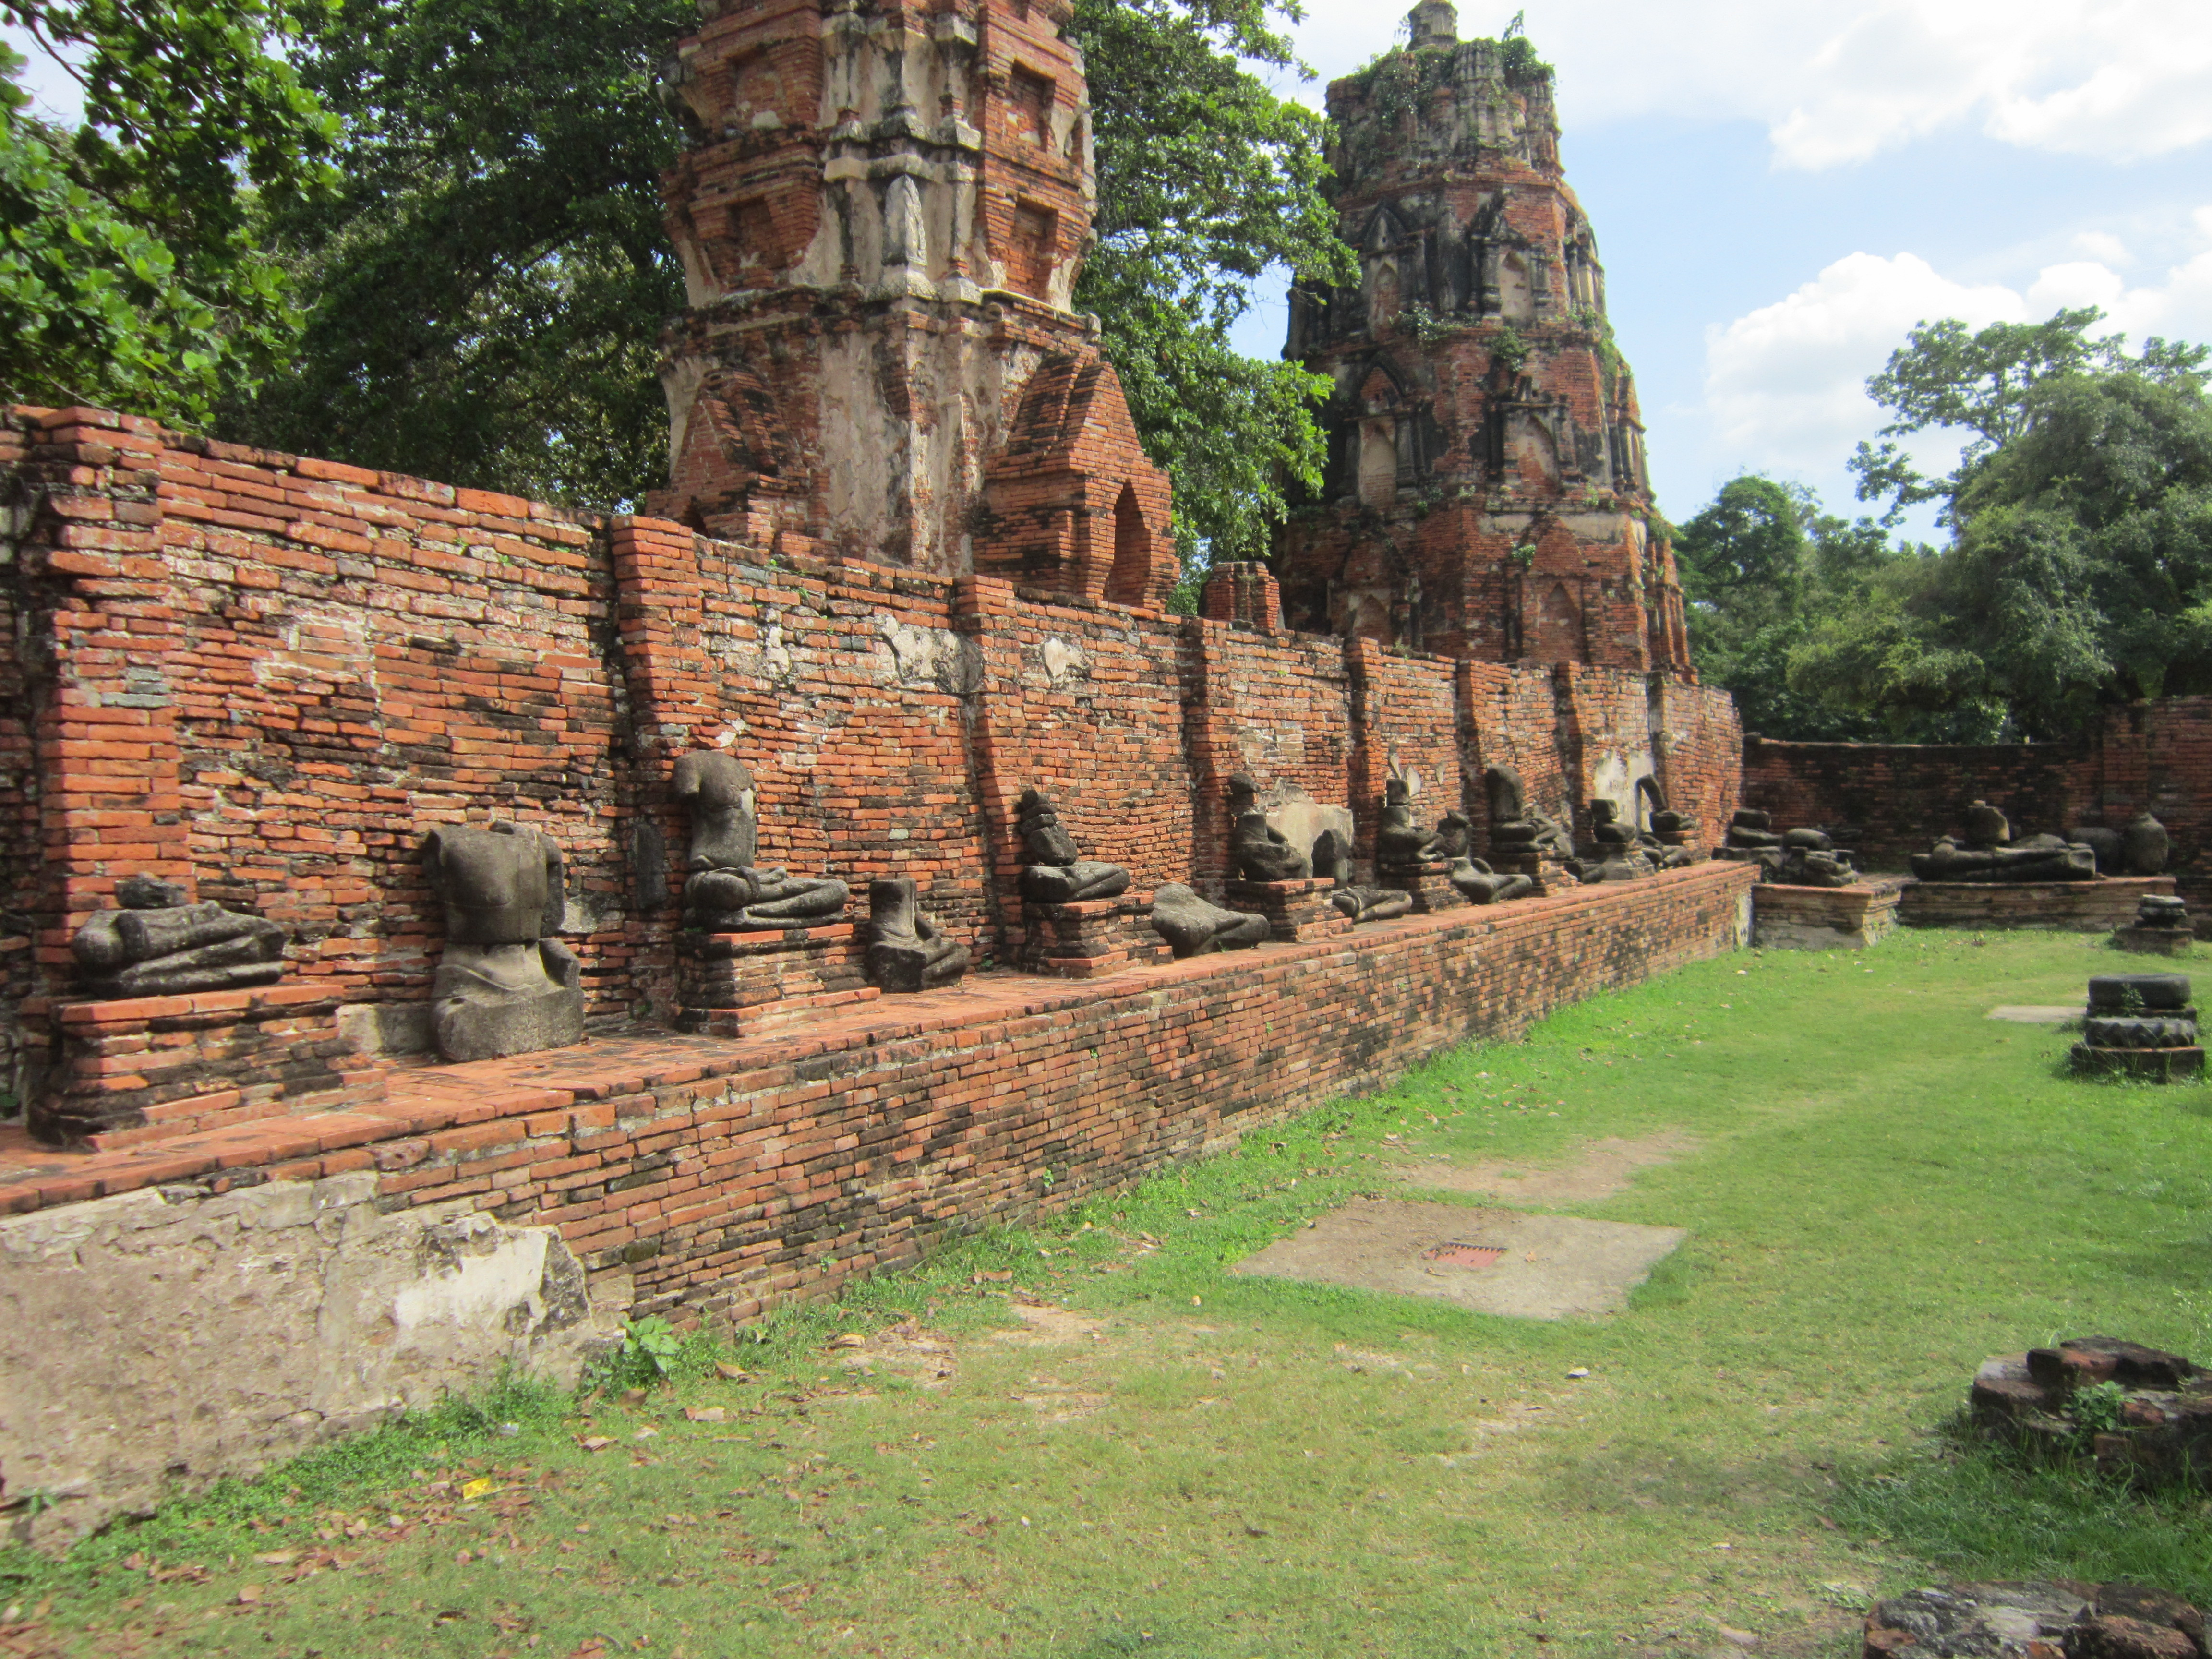 Decapitated Buddha statues in Ayutthaya Historical Park